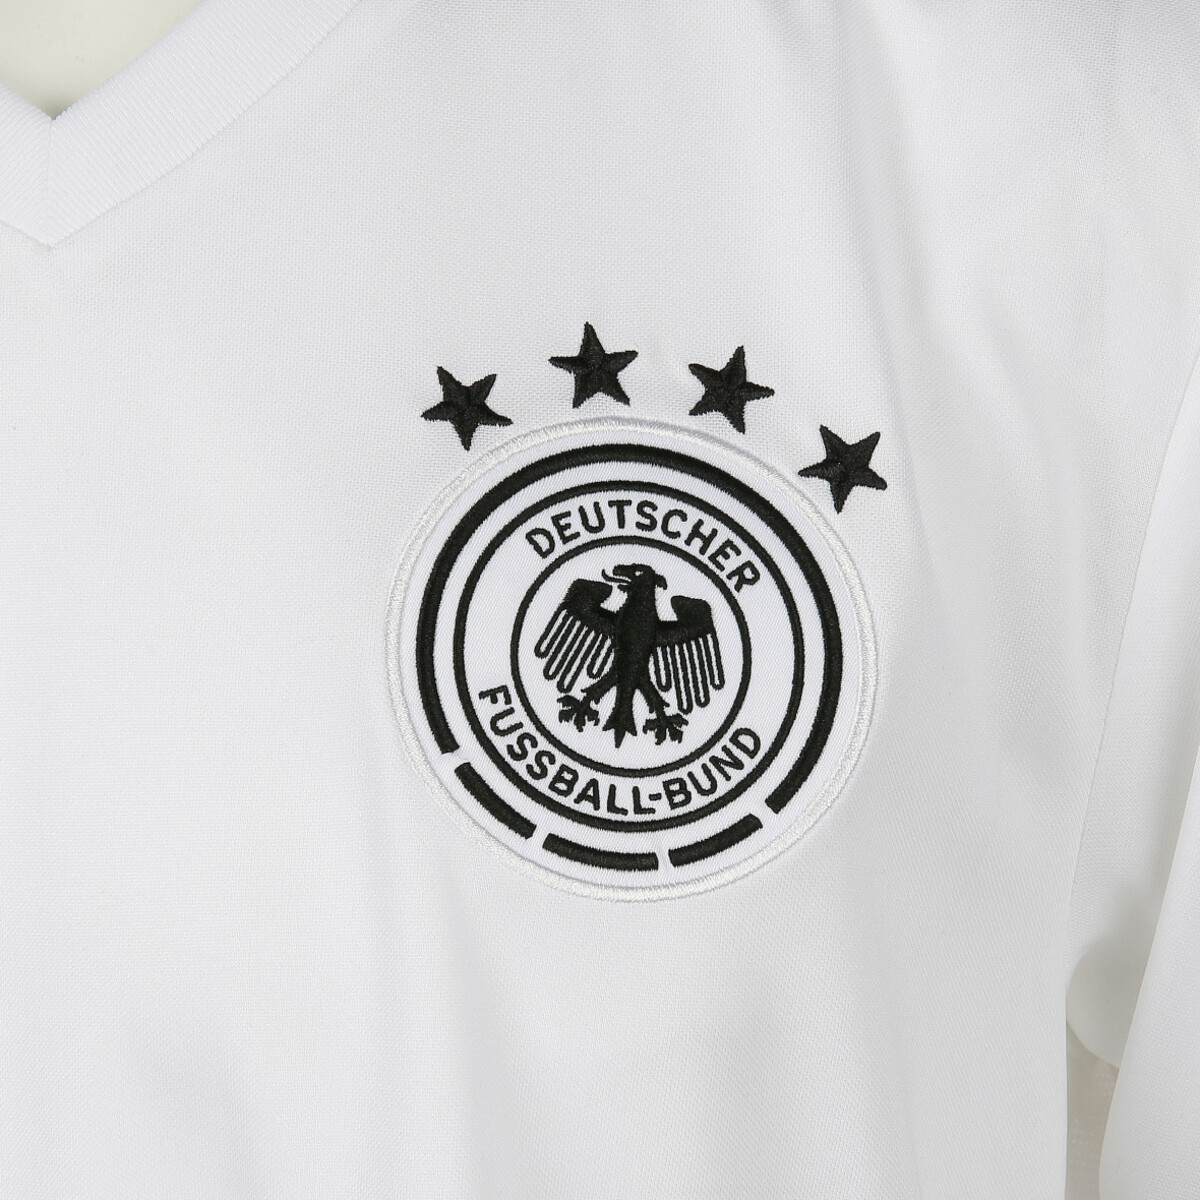 Bild 3 von Herren DFB Trainings Trikot